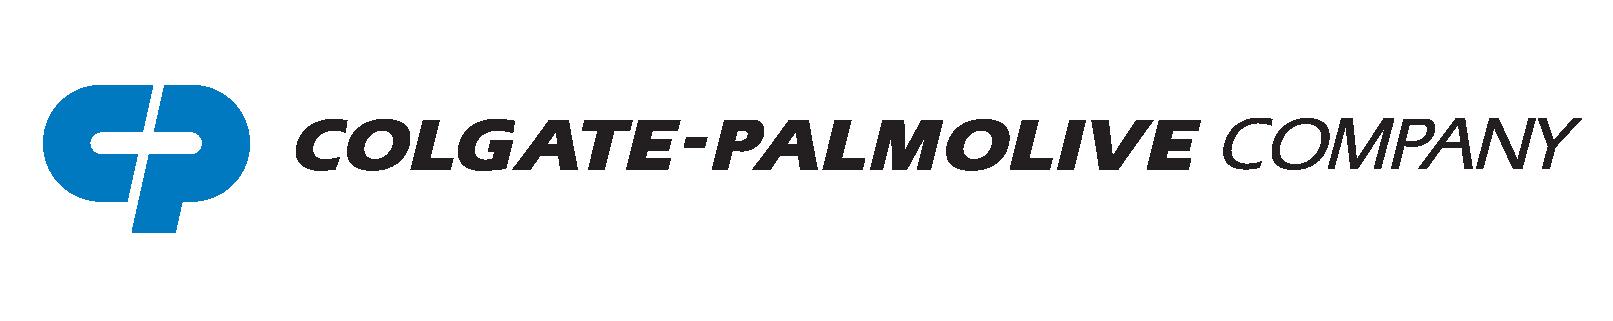 https://europeanplasticspact.org/wp-content/uploads/2021/05/colgate-palmolive-company-logo-blue-eps-1.png